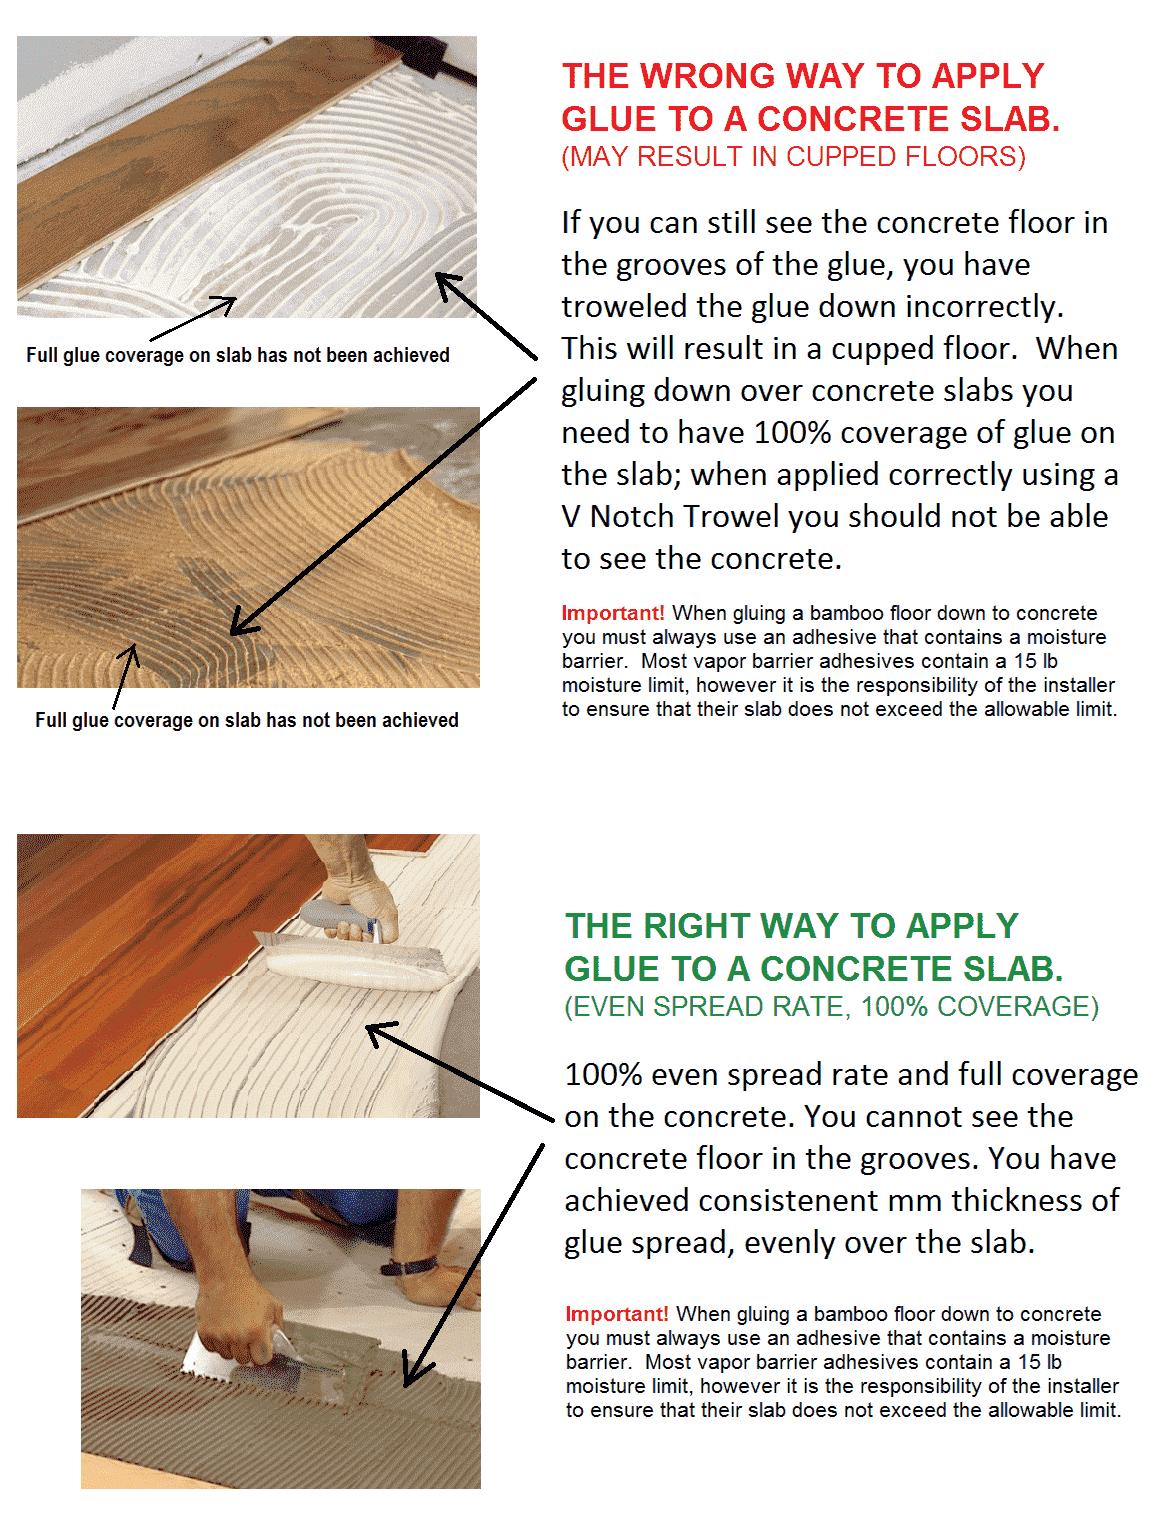 bamboofloorconcreteslab